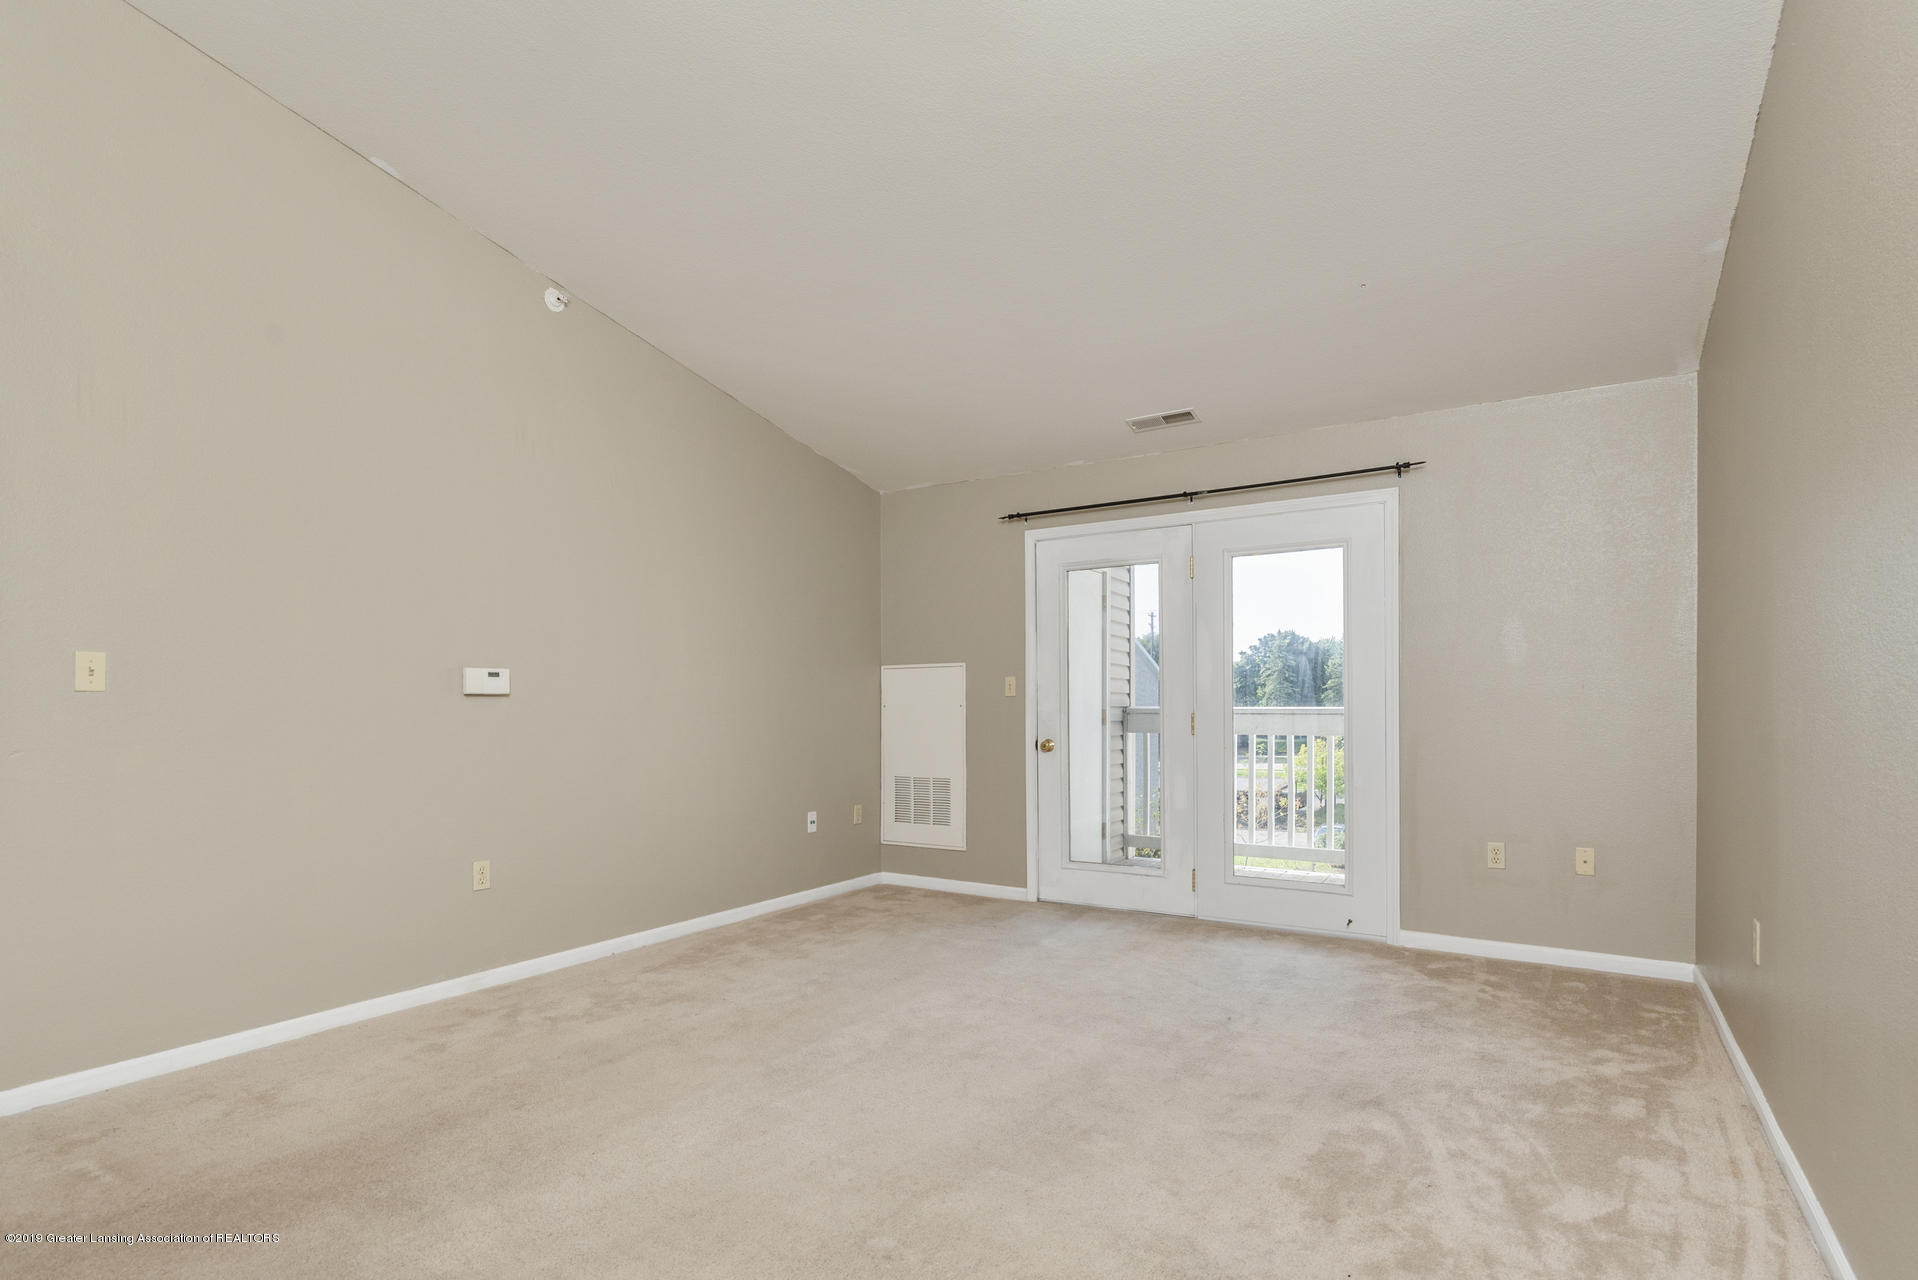 338 W Saginaw St UNIT 44 - 004-photo-living-room-7483691 - 5